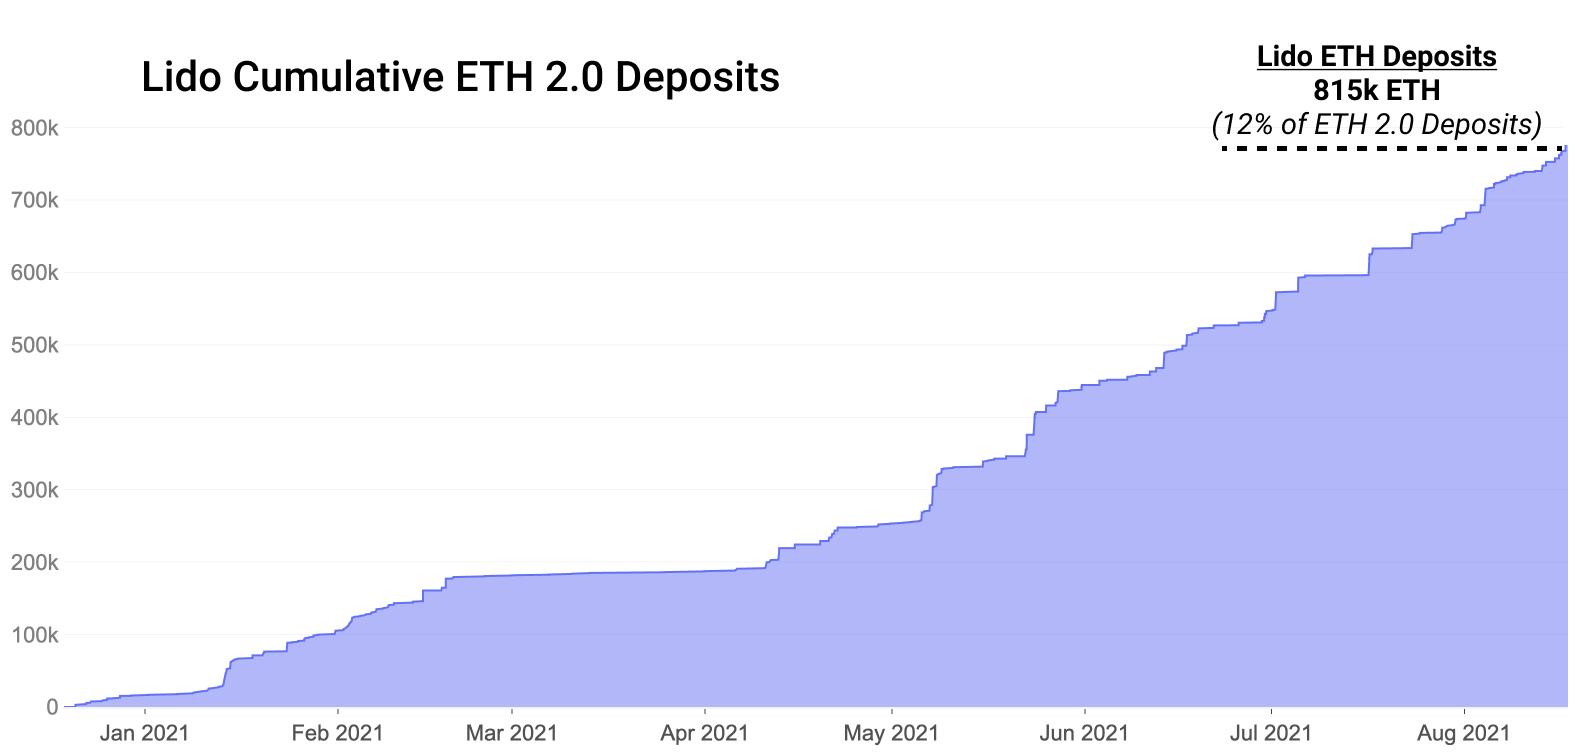 Gesamtmenge an Ether im ETH 2.0 Staking via Lido Finance